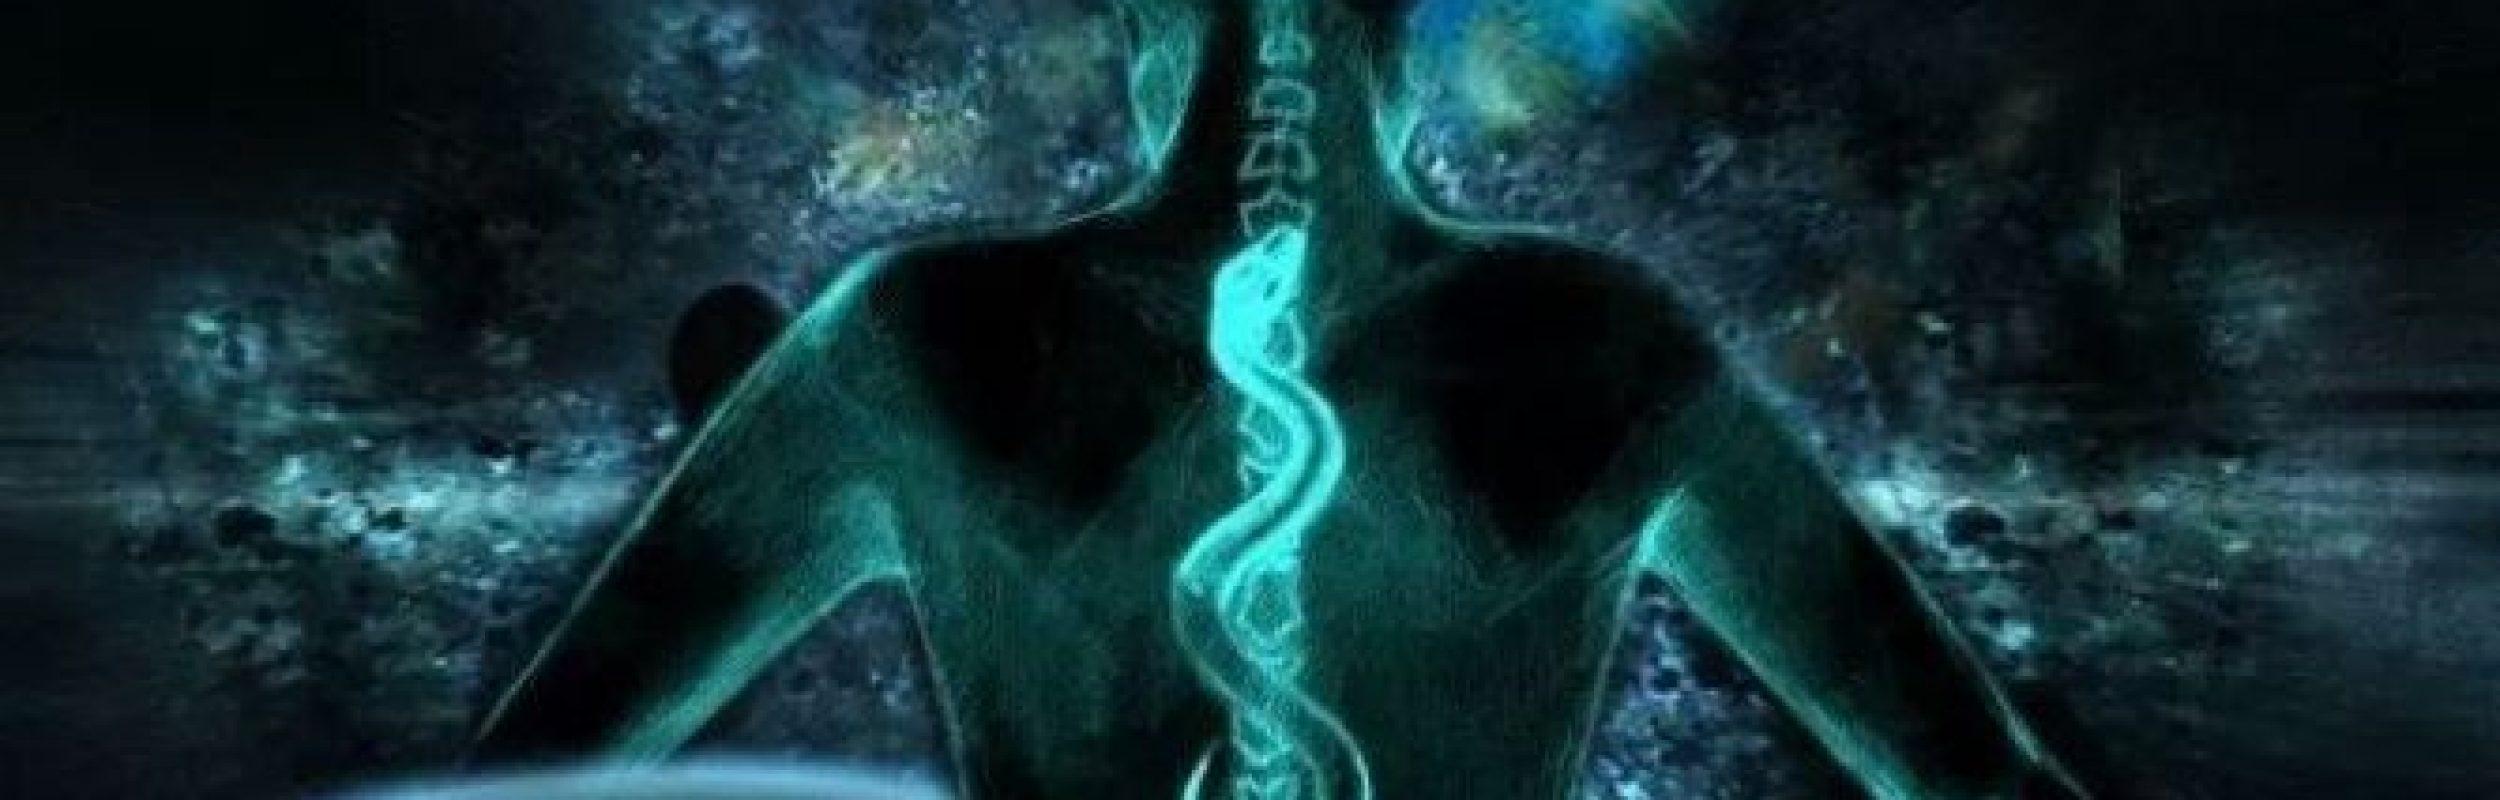 Kundalini, ADN, Parasitación y Fibromialgia